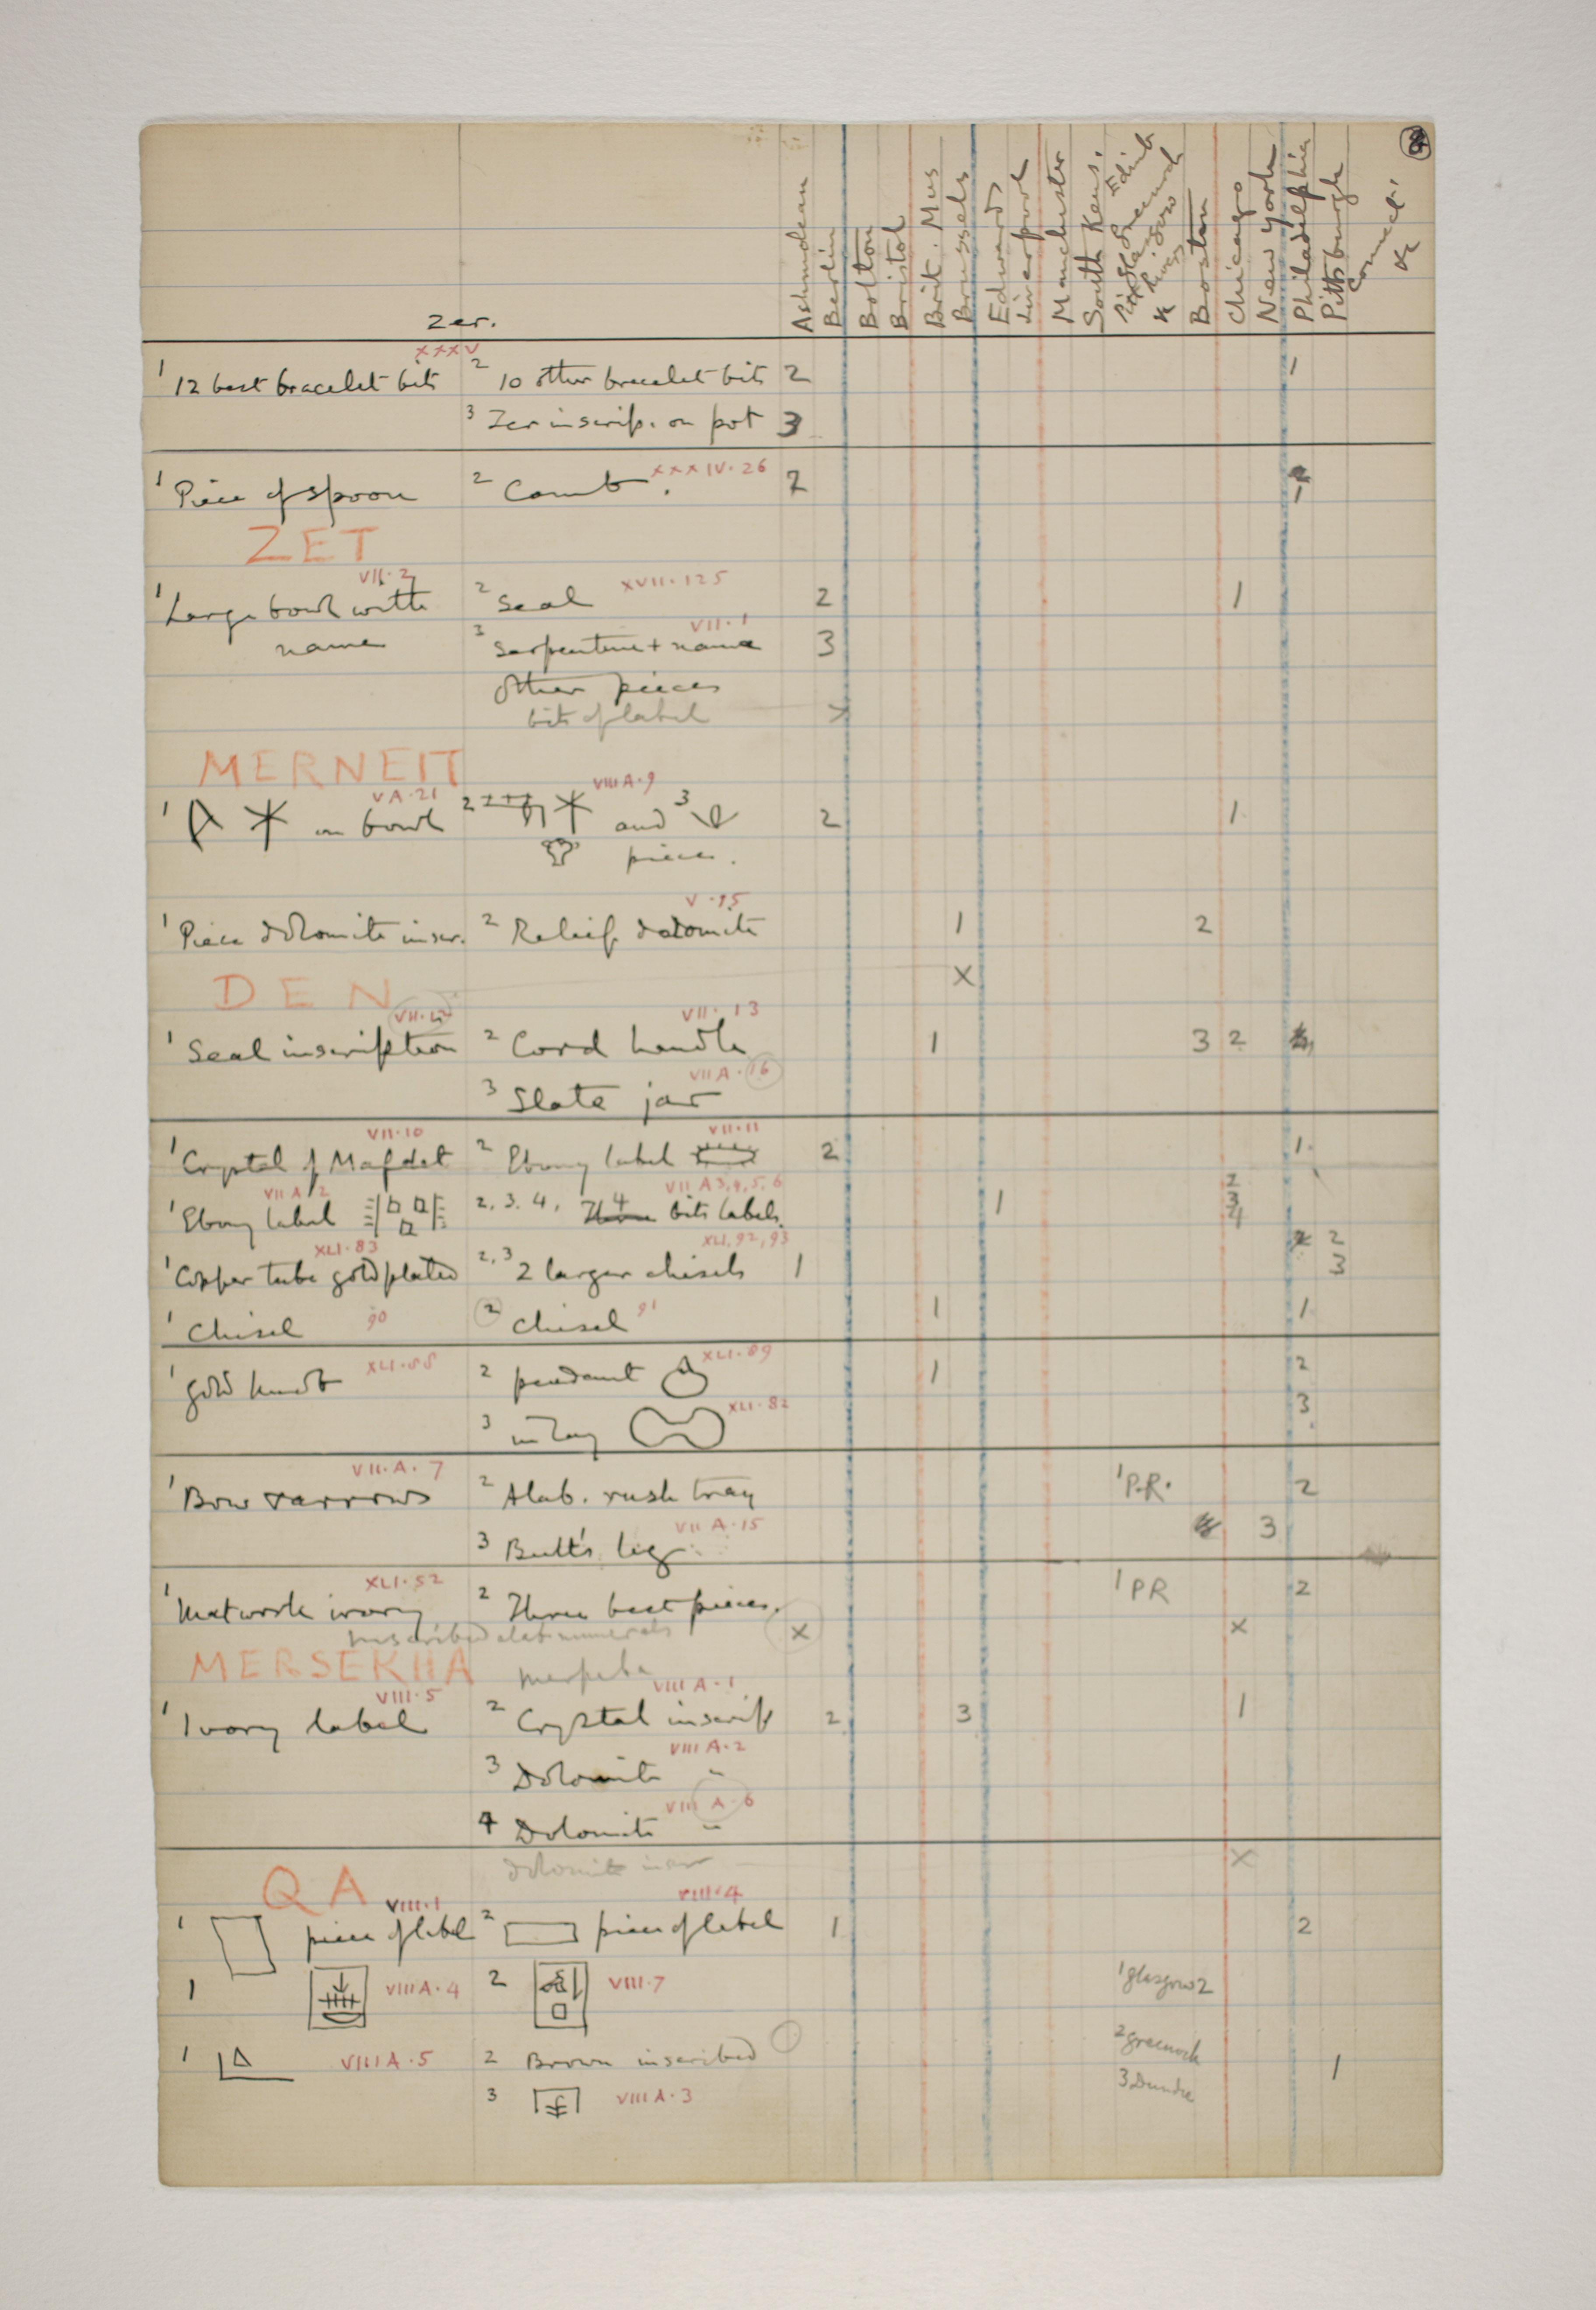 Abydos, Bet Khallaf, el-Mahasna 1900-1901, Distribution Grid, PMA/WFP1/D/9/8